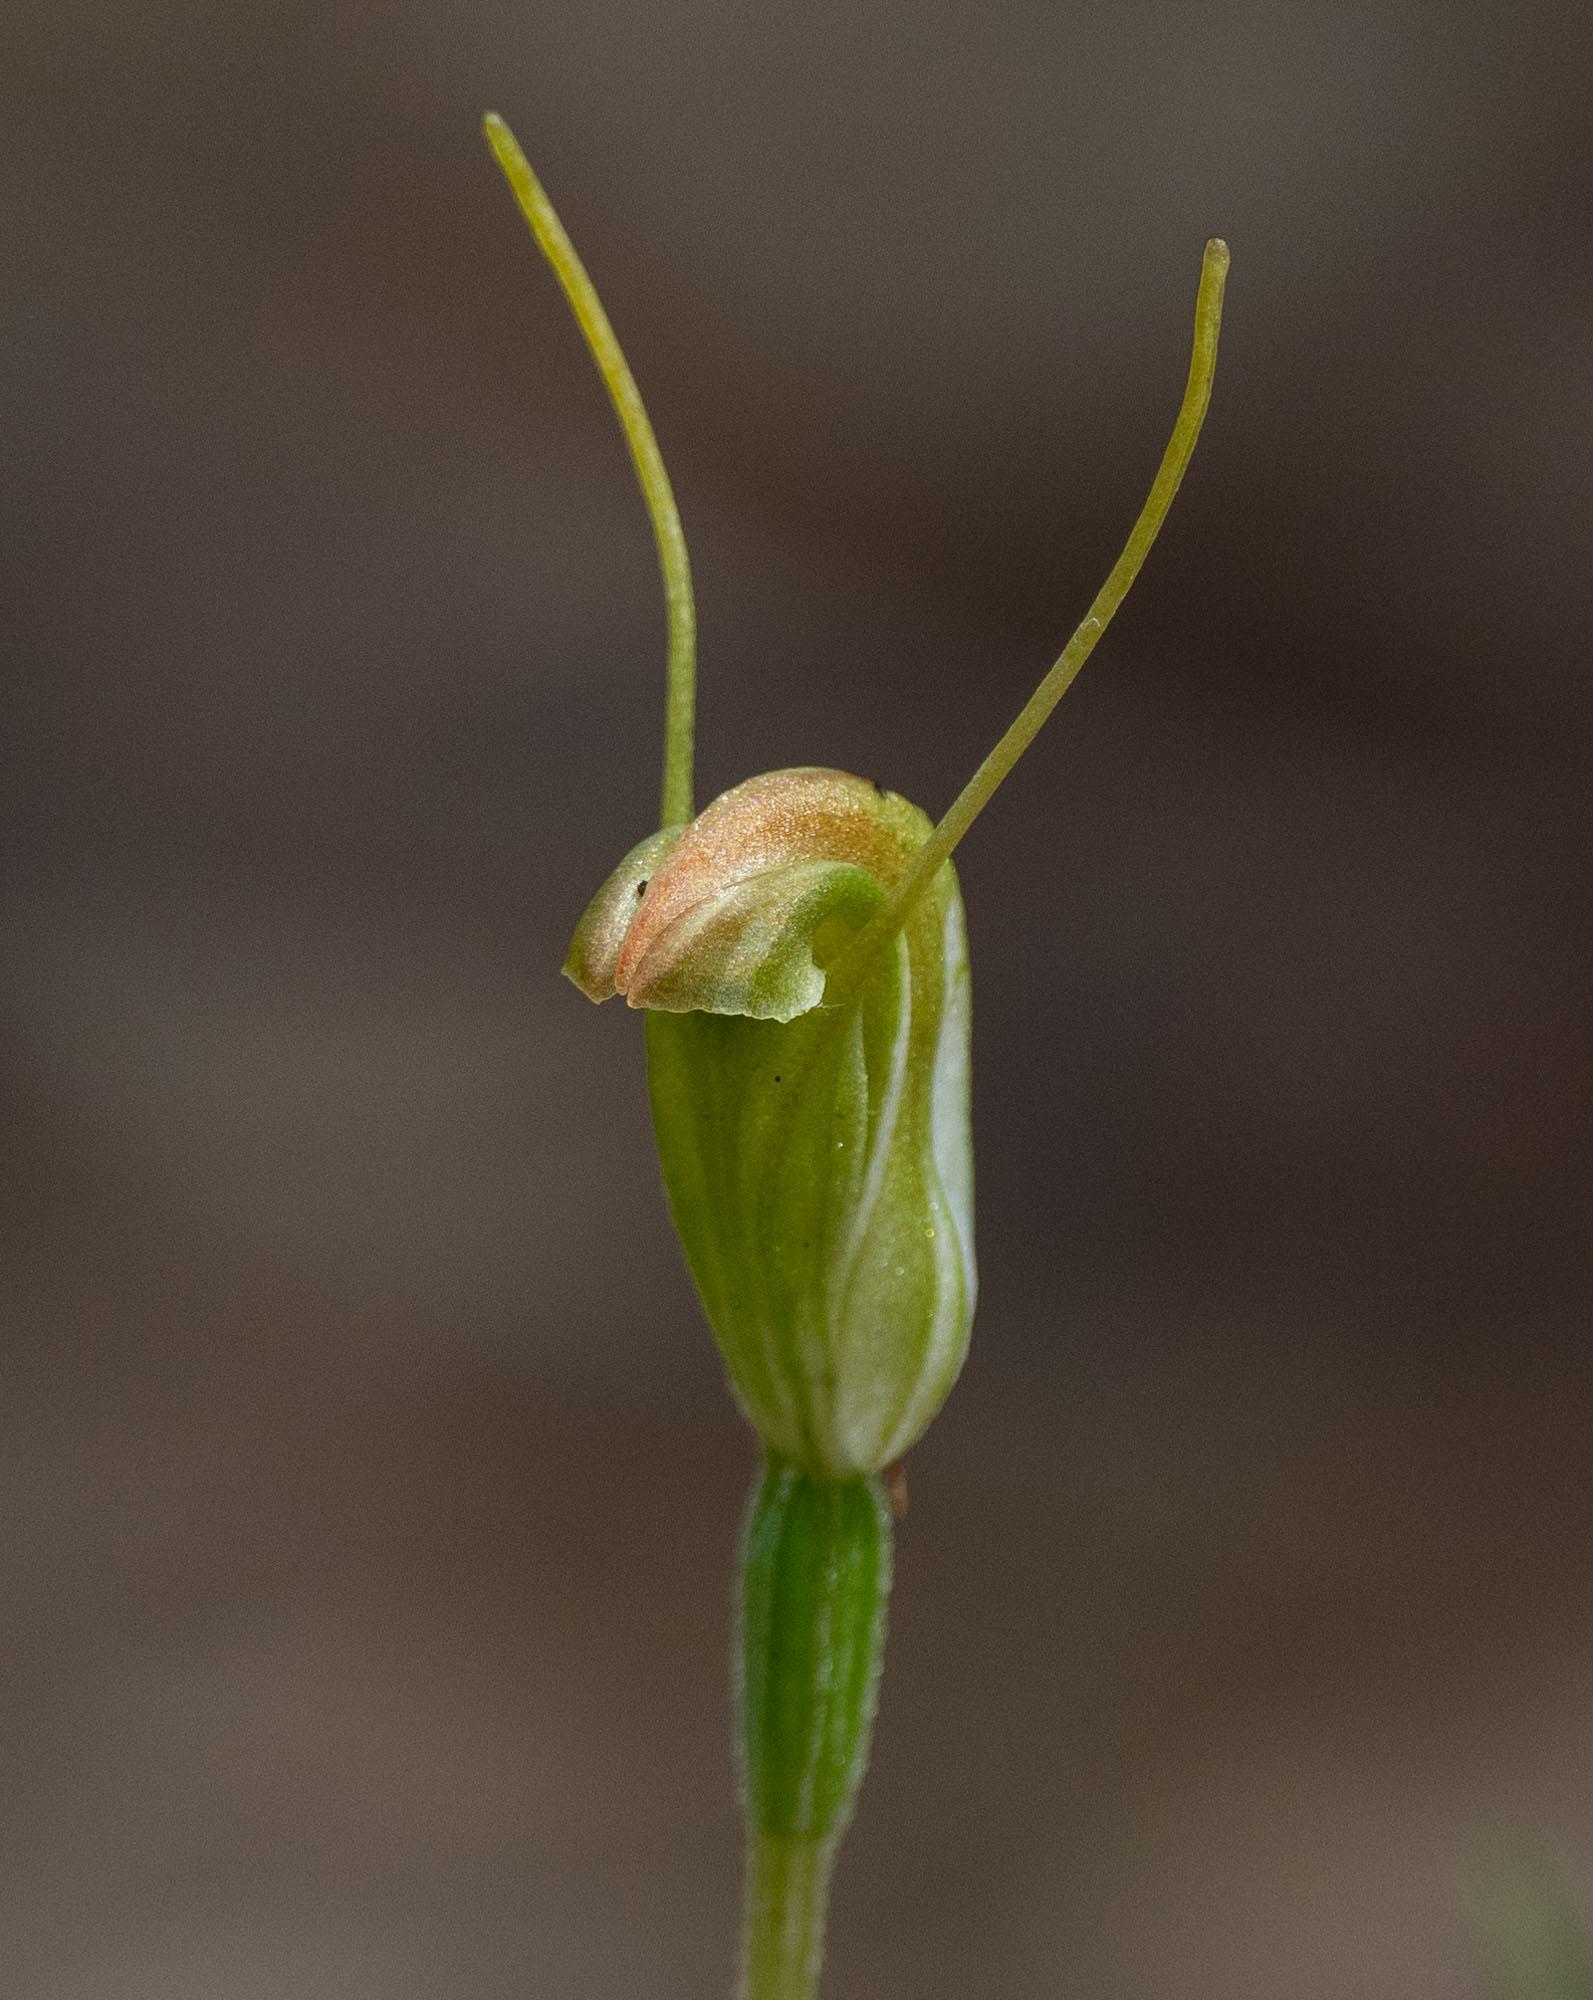 Pterostylis sp., Greenhood